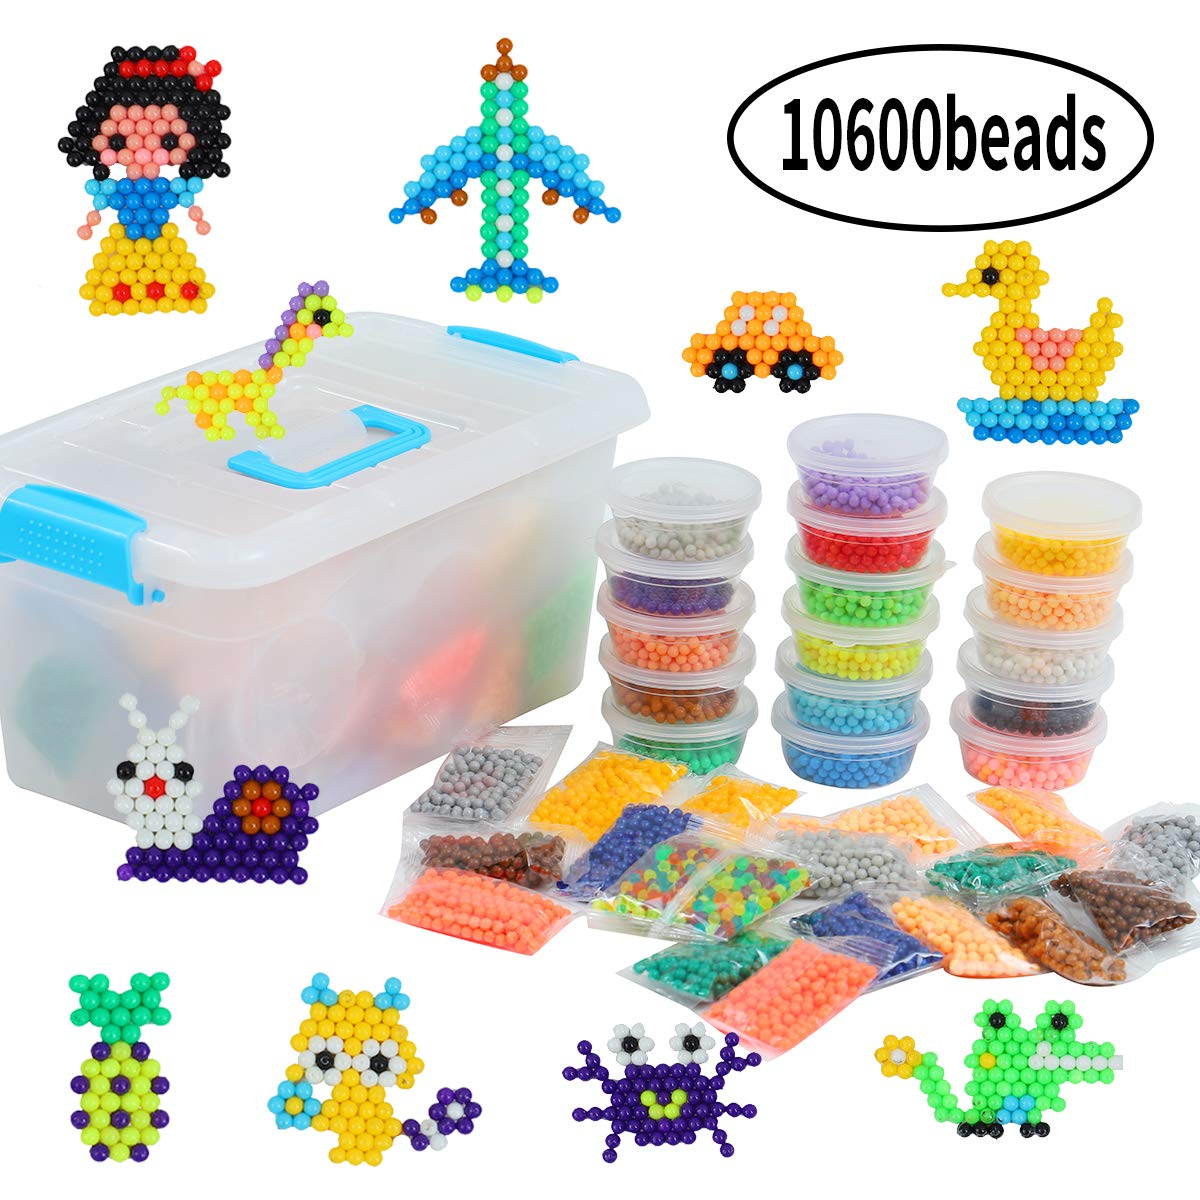 Vigeiya Fuse Beads DIY Art Craft Toys Activity Kit for Kids 24 Colors 10600pcs by Vigeiya